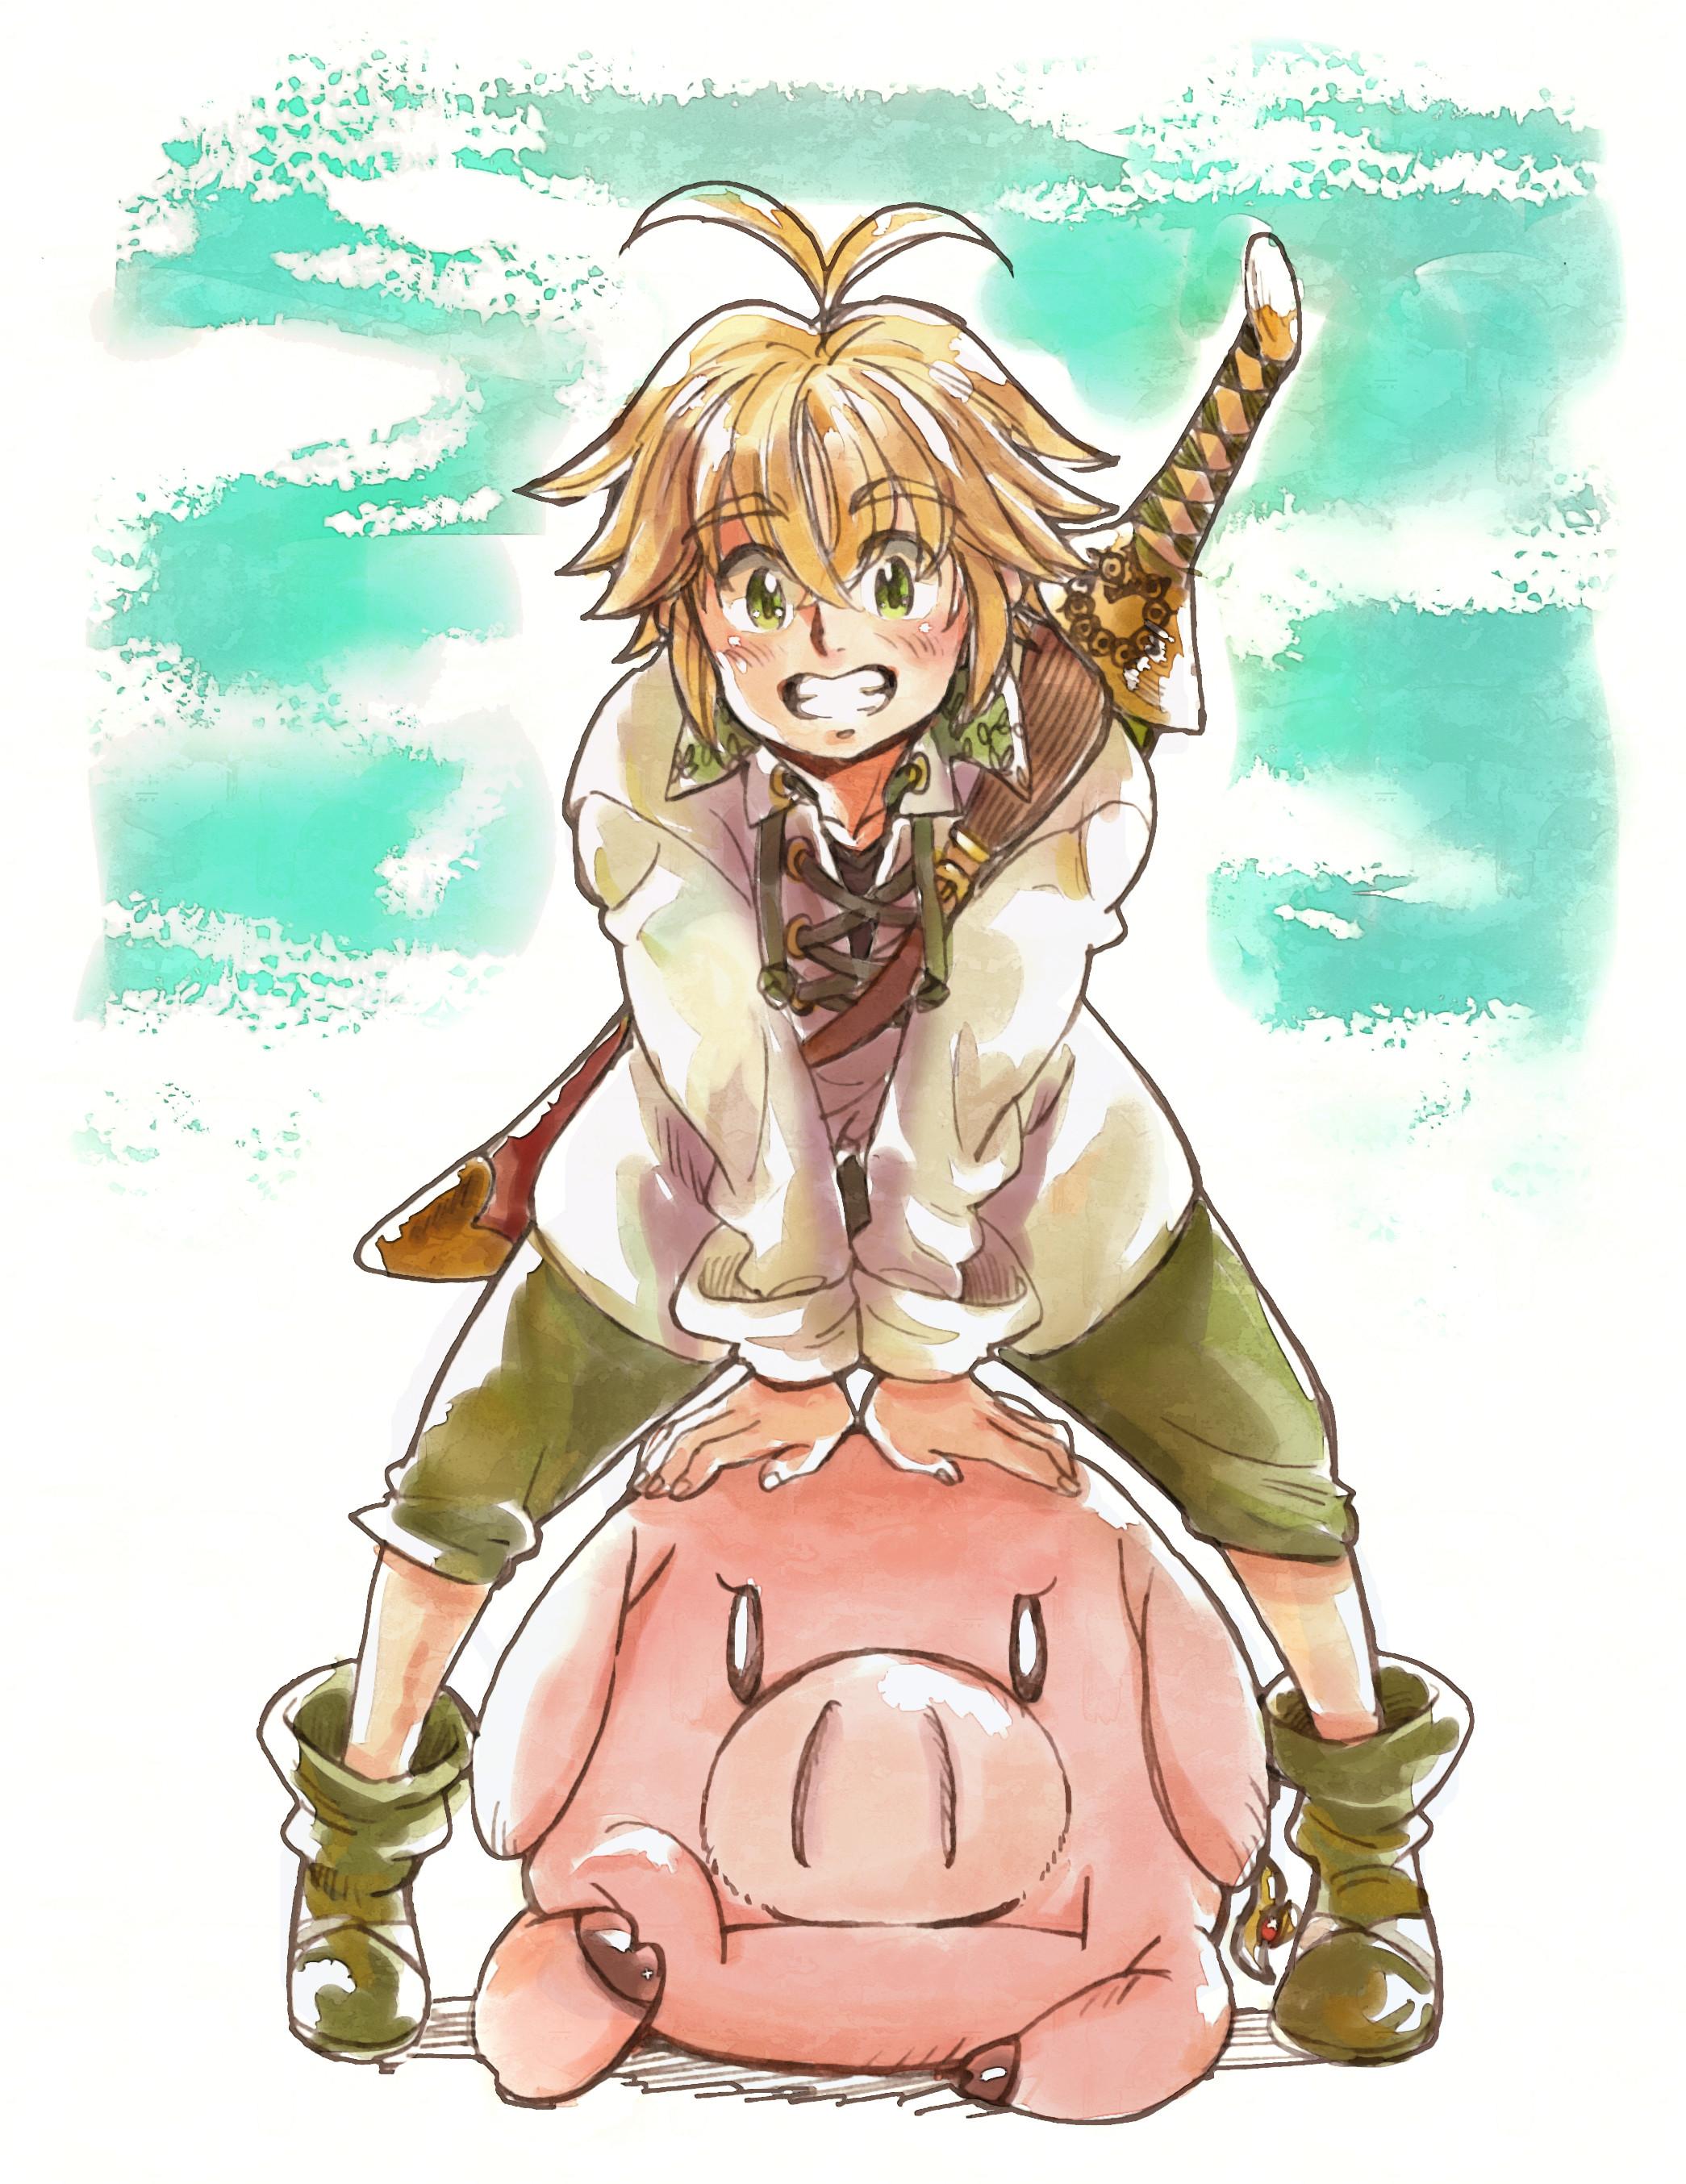 1984x1200 Anime Nanatsu No Taizai Meliodas Ban Elizabeth Liones Diane Sin Of Envy Fairy